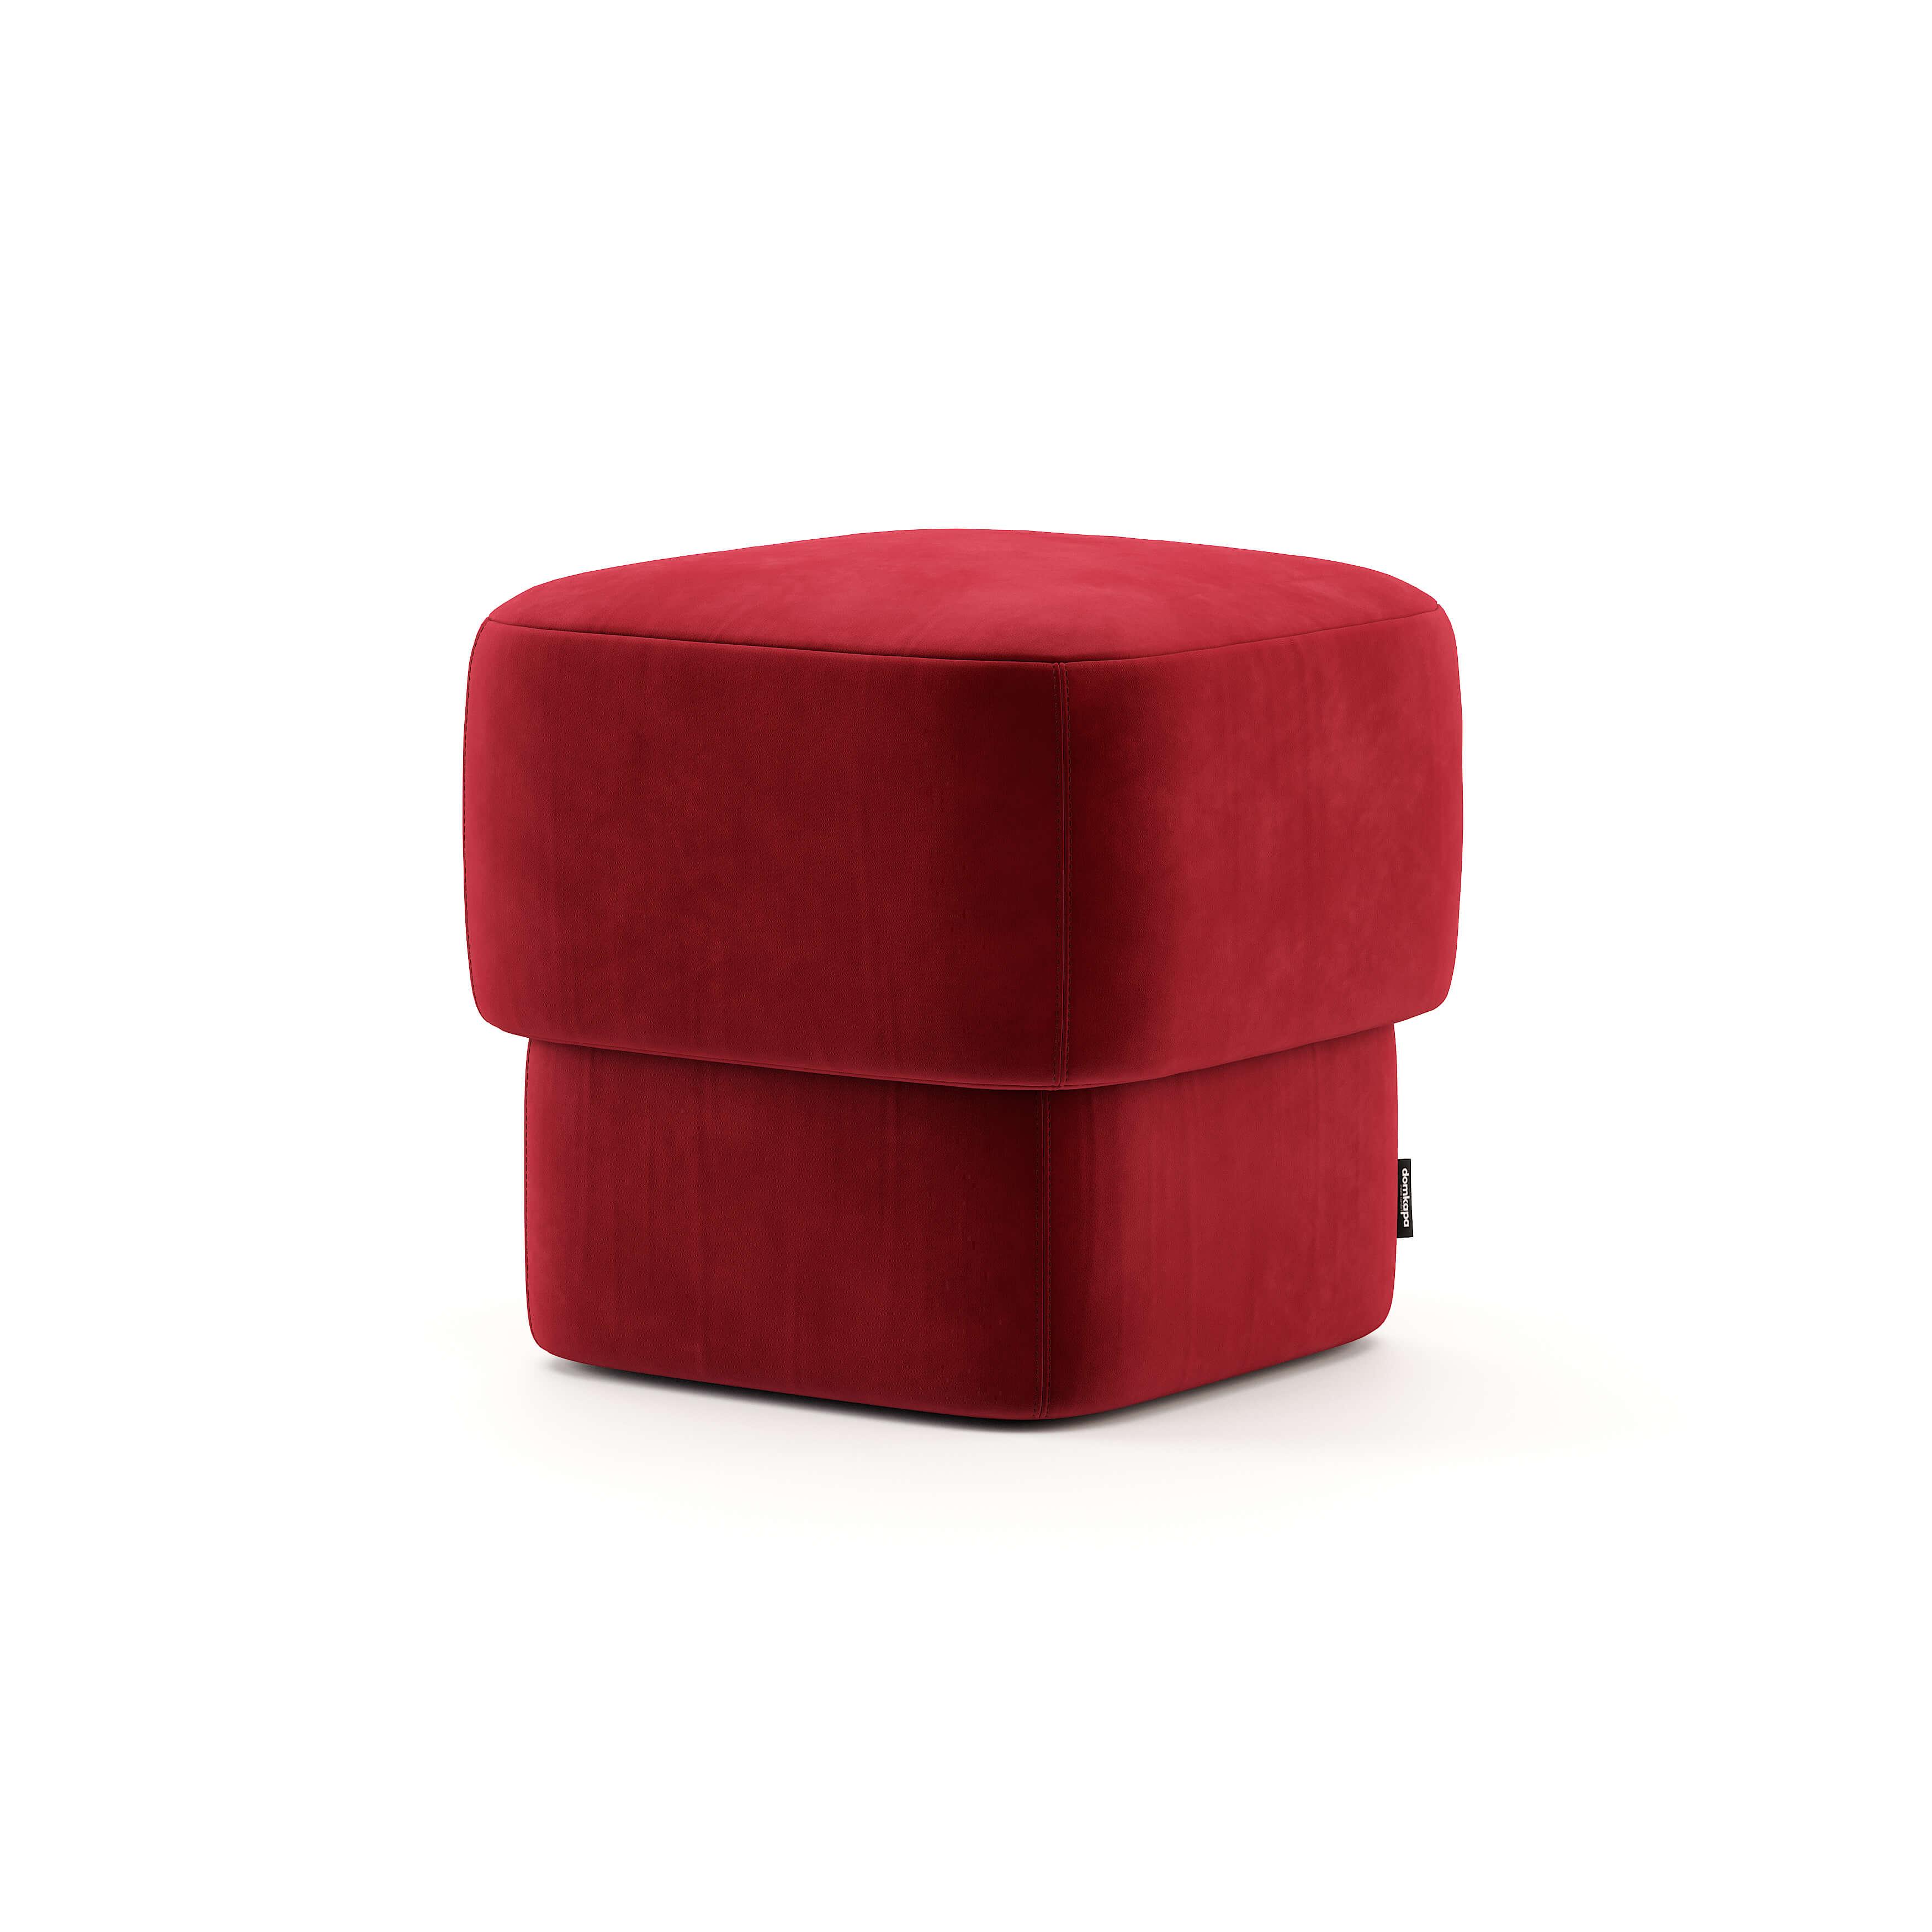 red-fever-kate-pouf-upholstered-furniture-interior-design-home-decor-domkapa